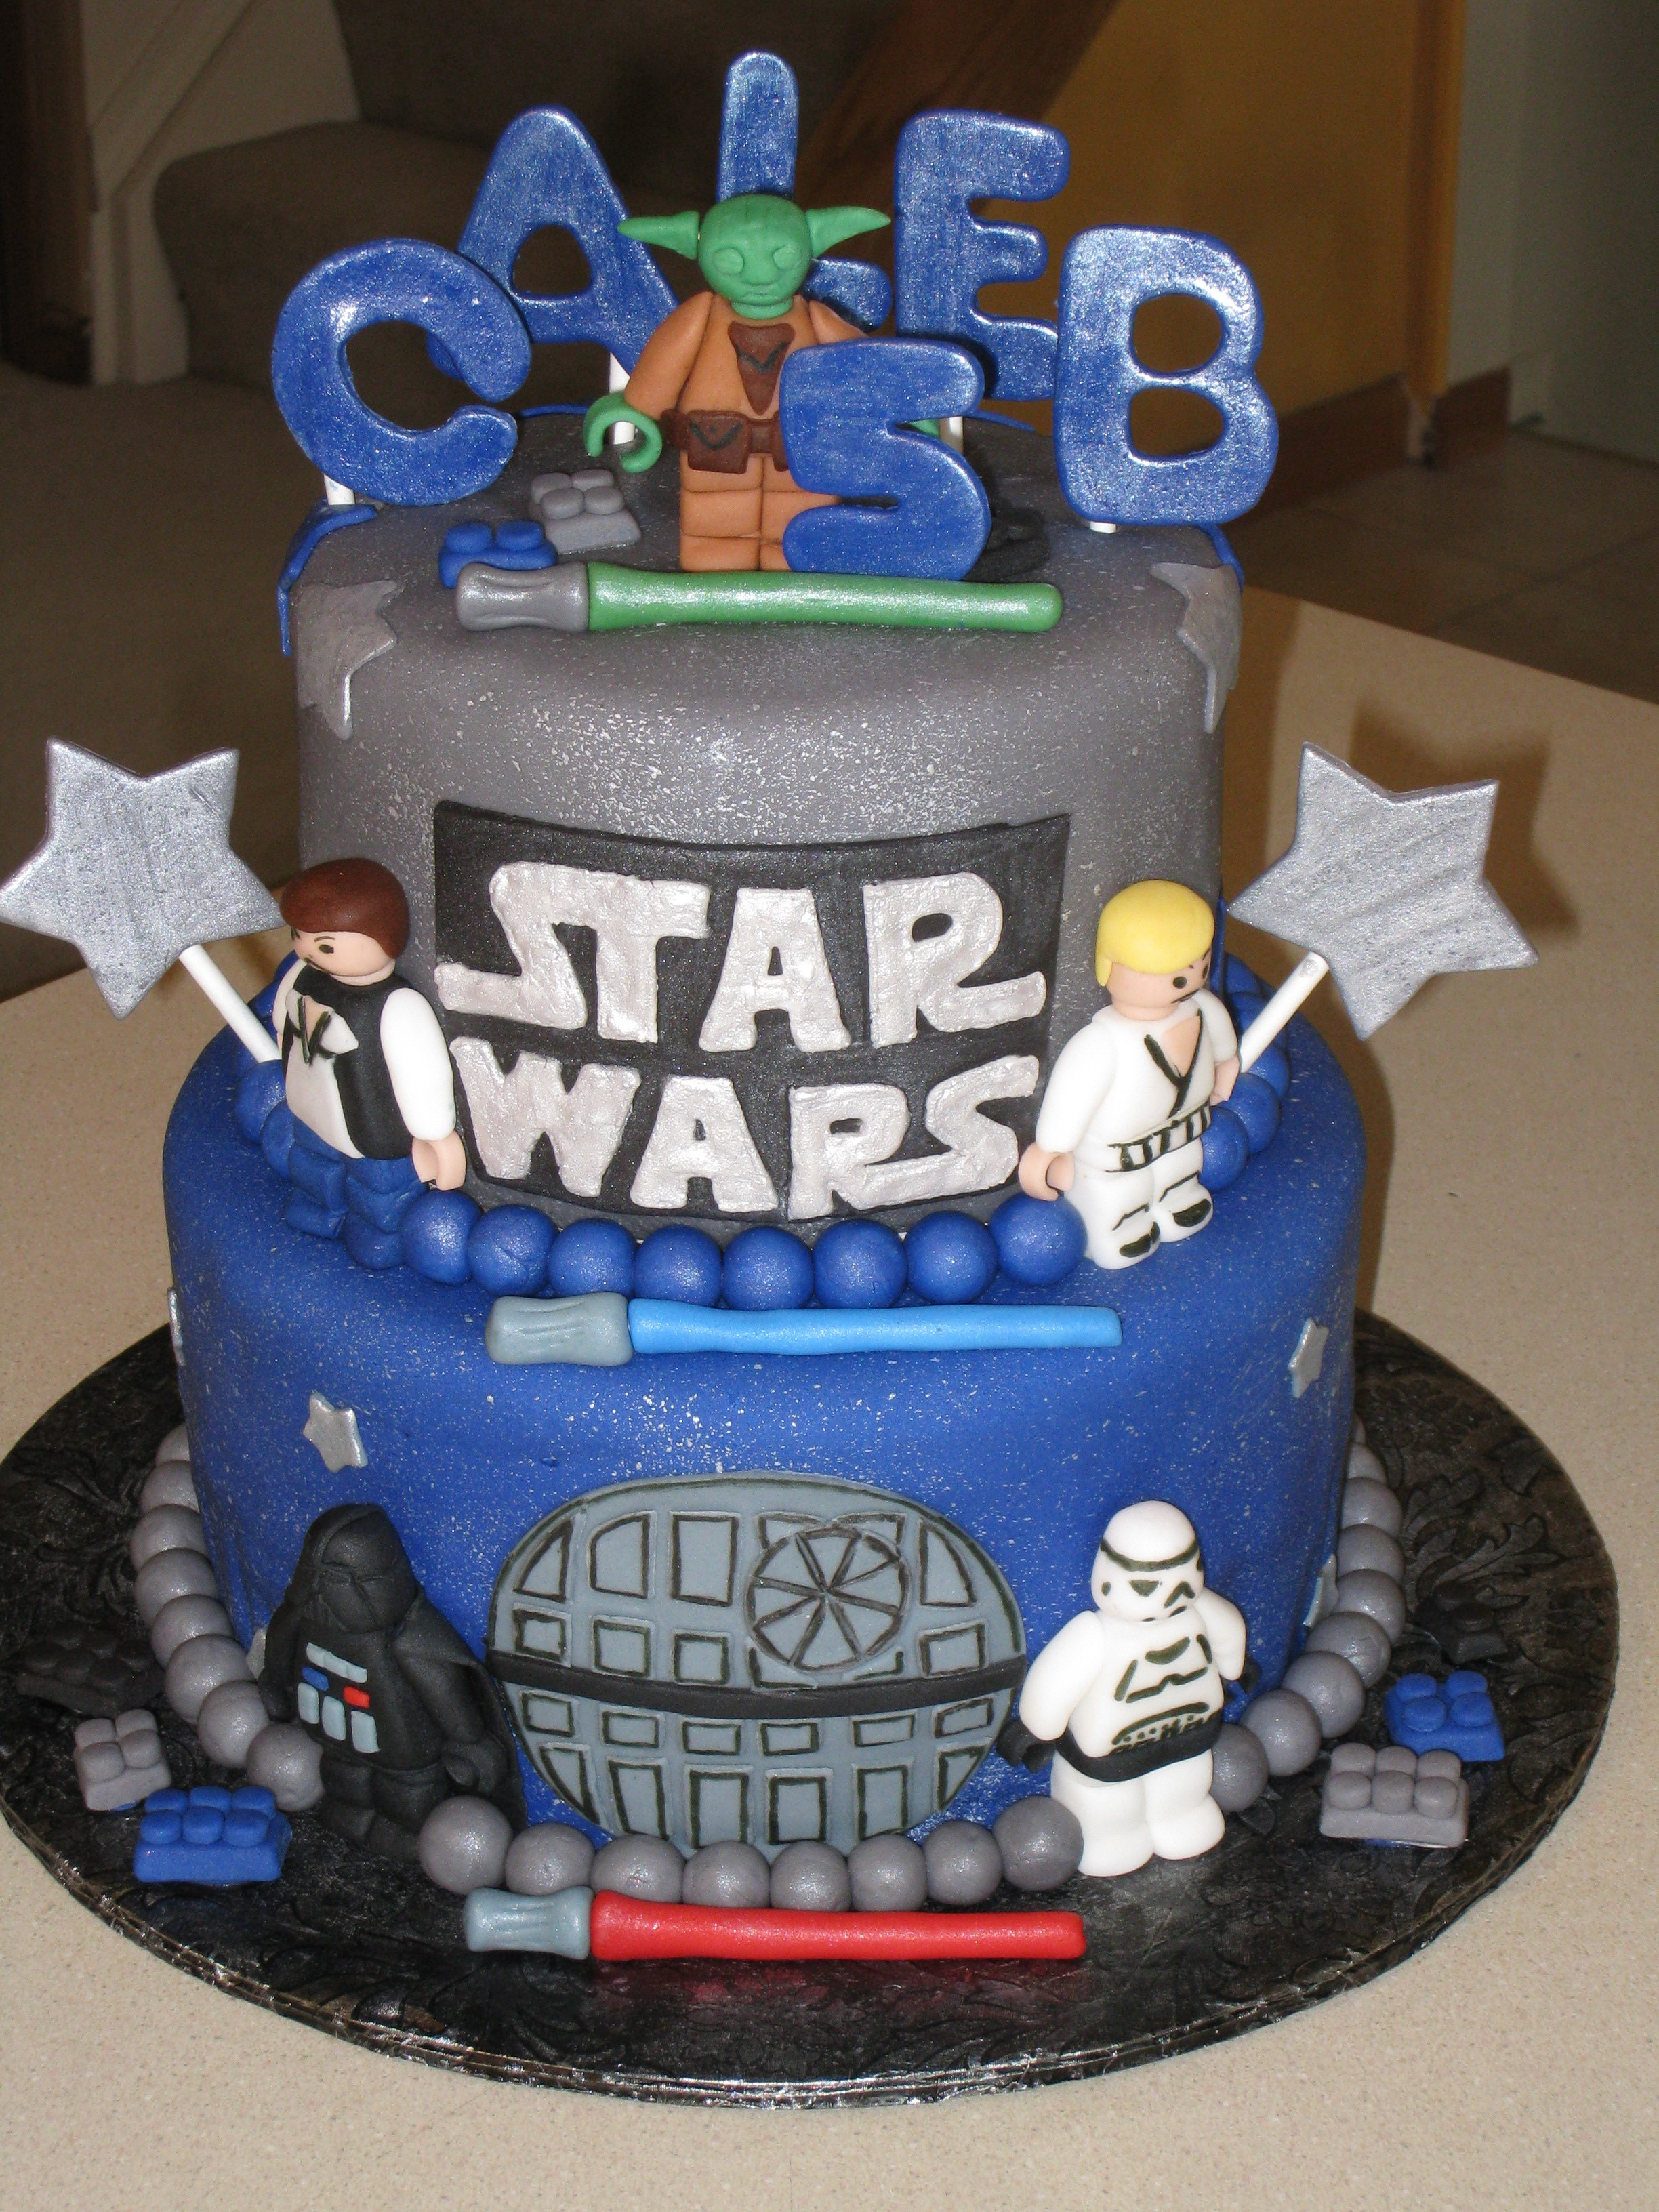 Star Wars Lego Birthday Party Decorations